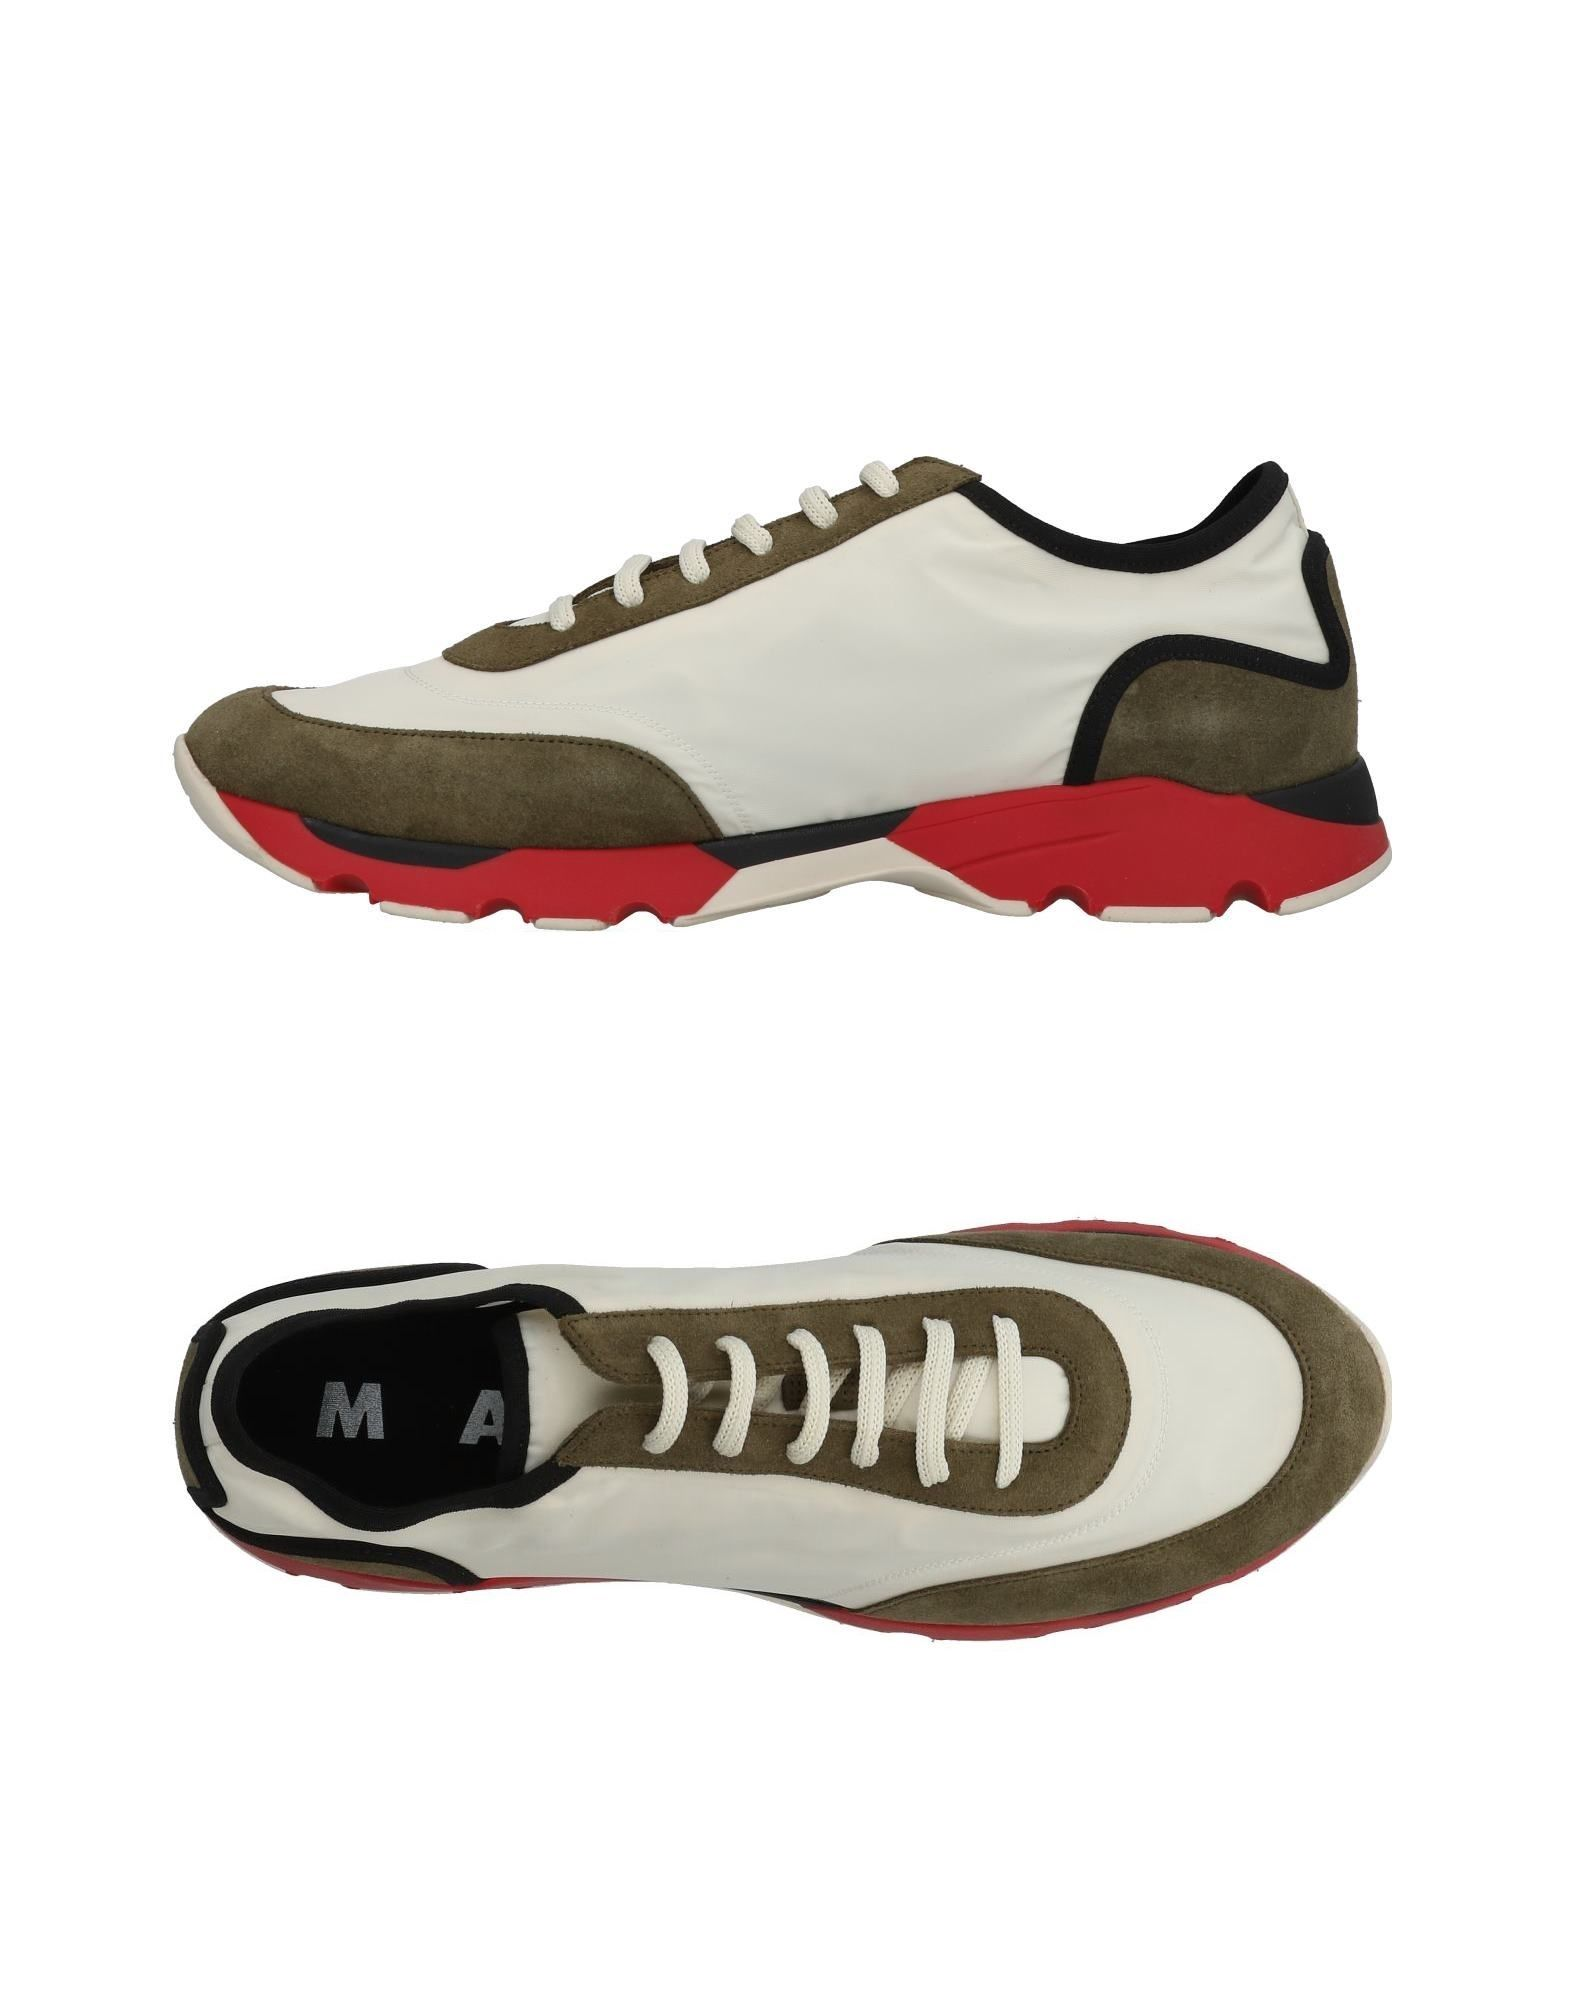 Marni Sneakers Herren  11423789TS Gute Qualität beliebte Schuhe